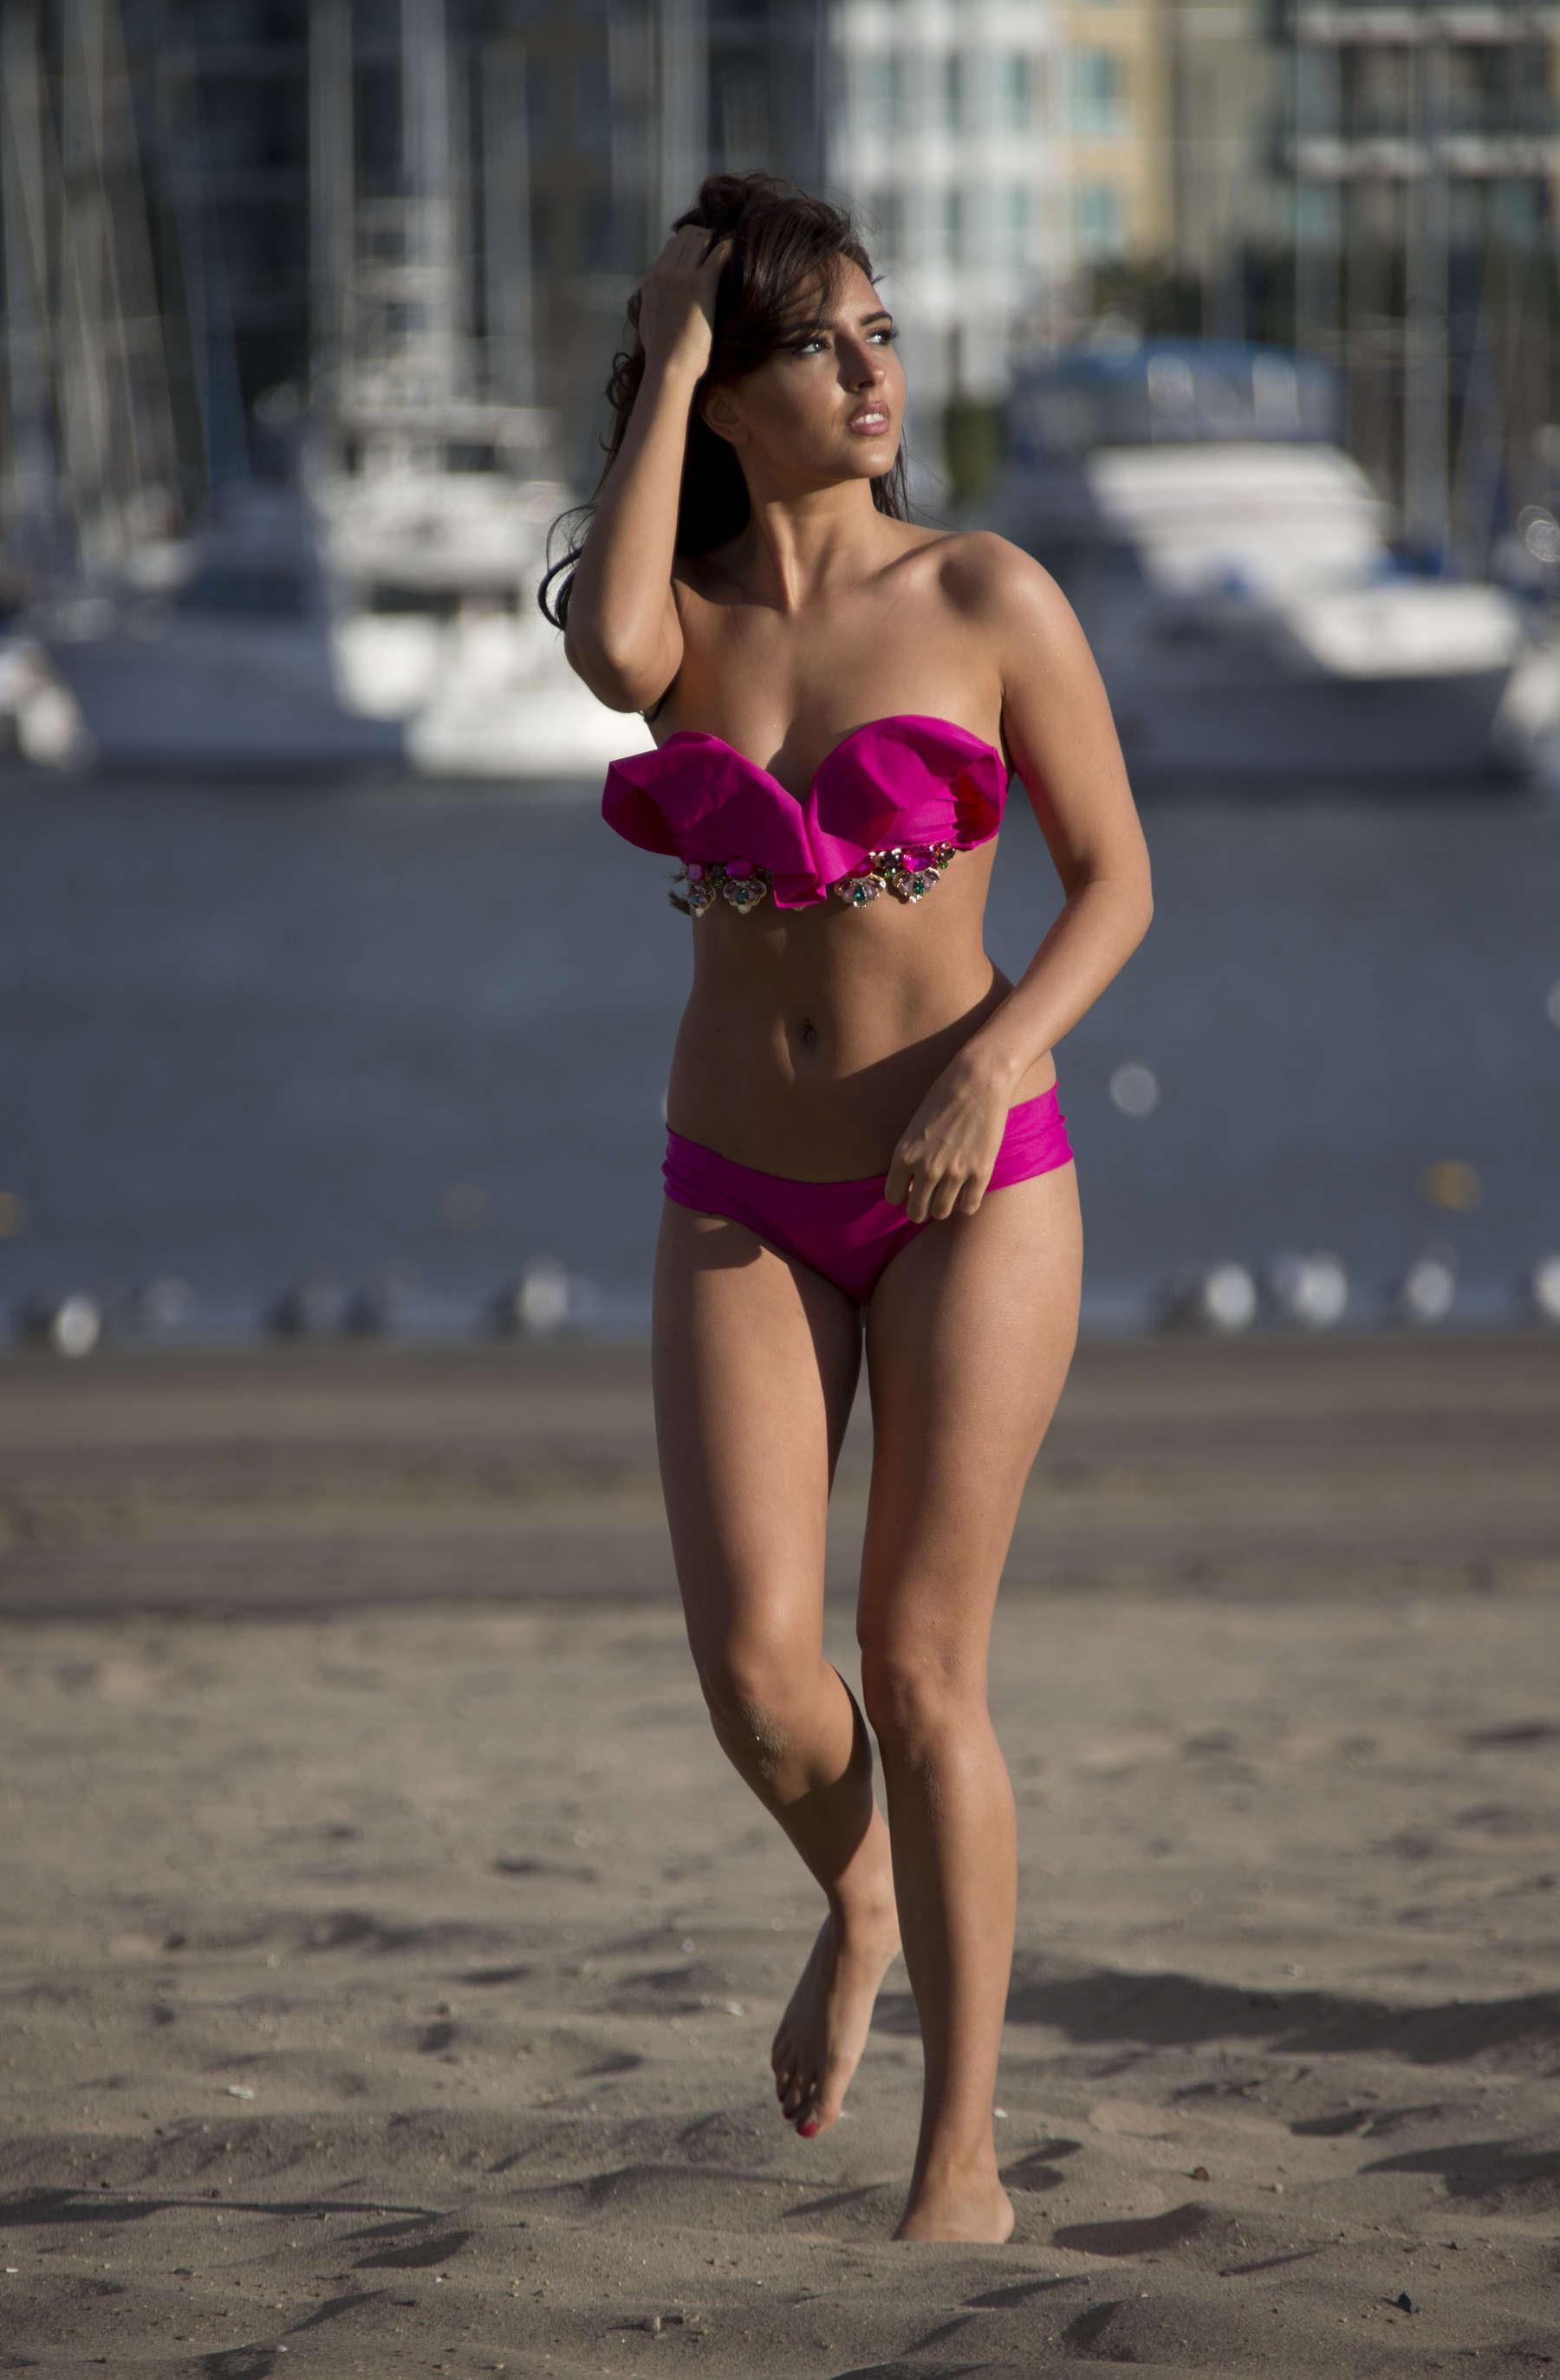 Nadia Forde 2016 : Nadia Forde in Pink Bikini -06